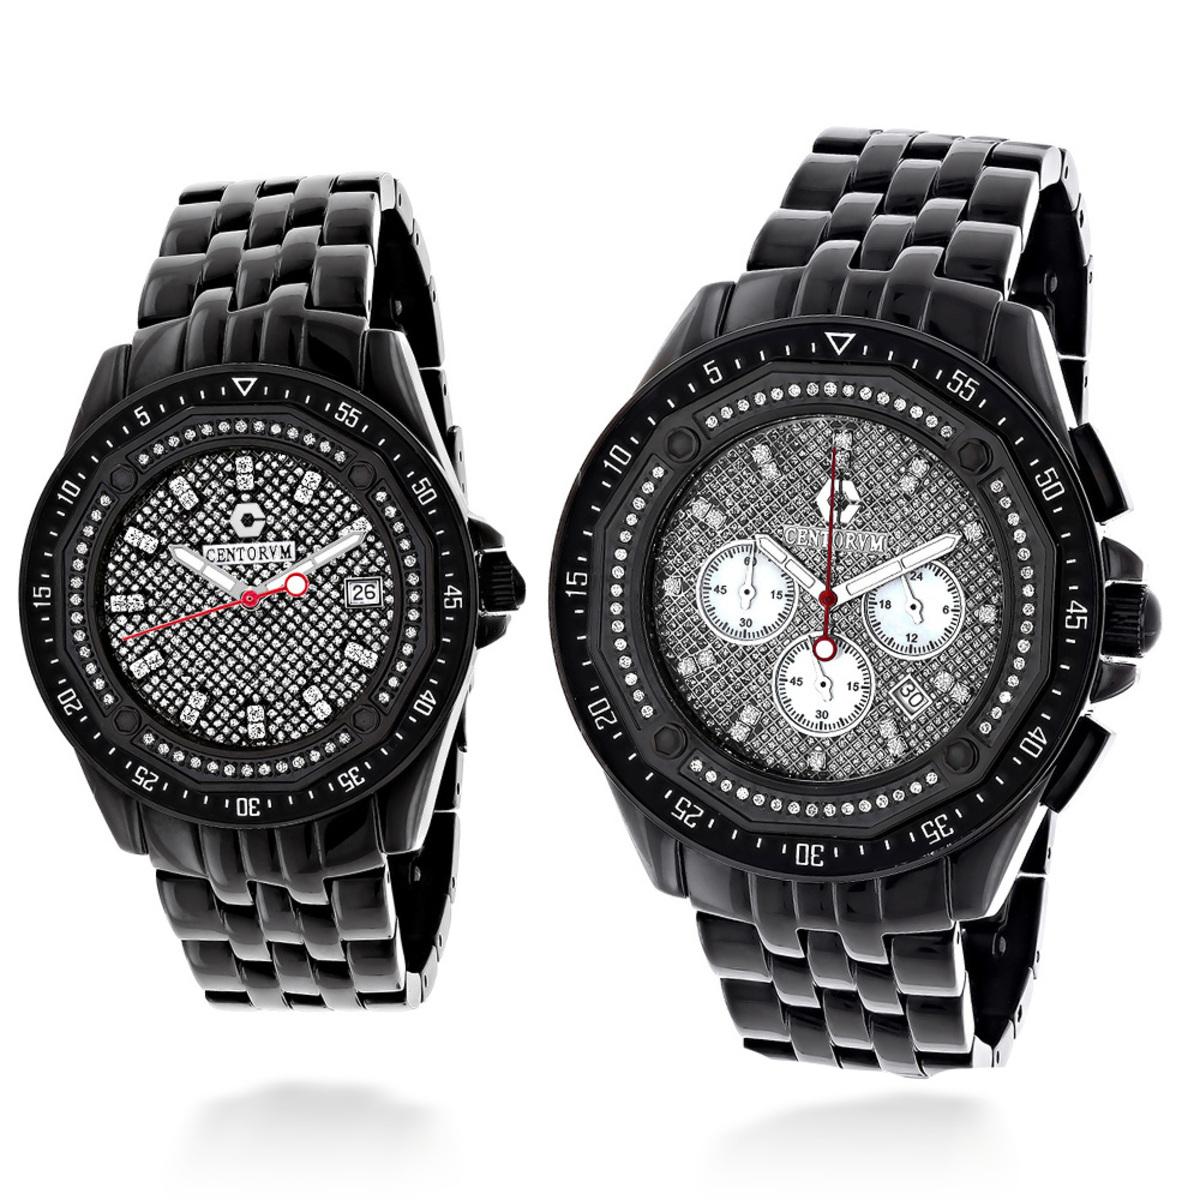 His and Hers Watches: Centorum Chronograph Diamond Watch Set 1.05ct Black